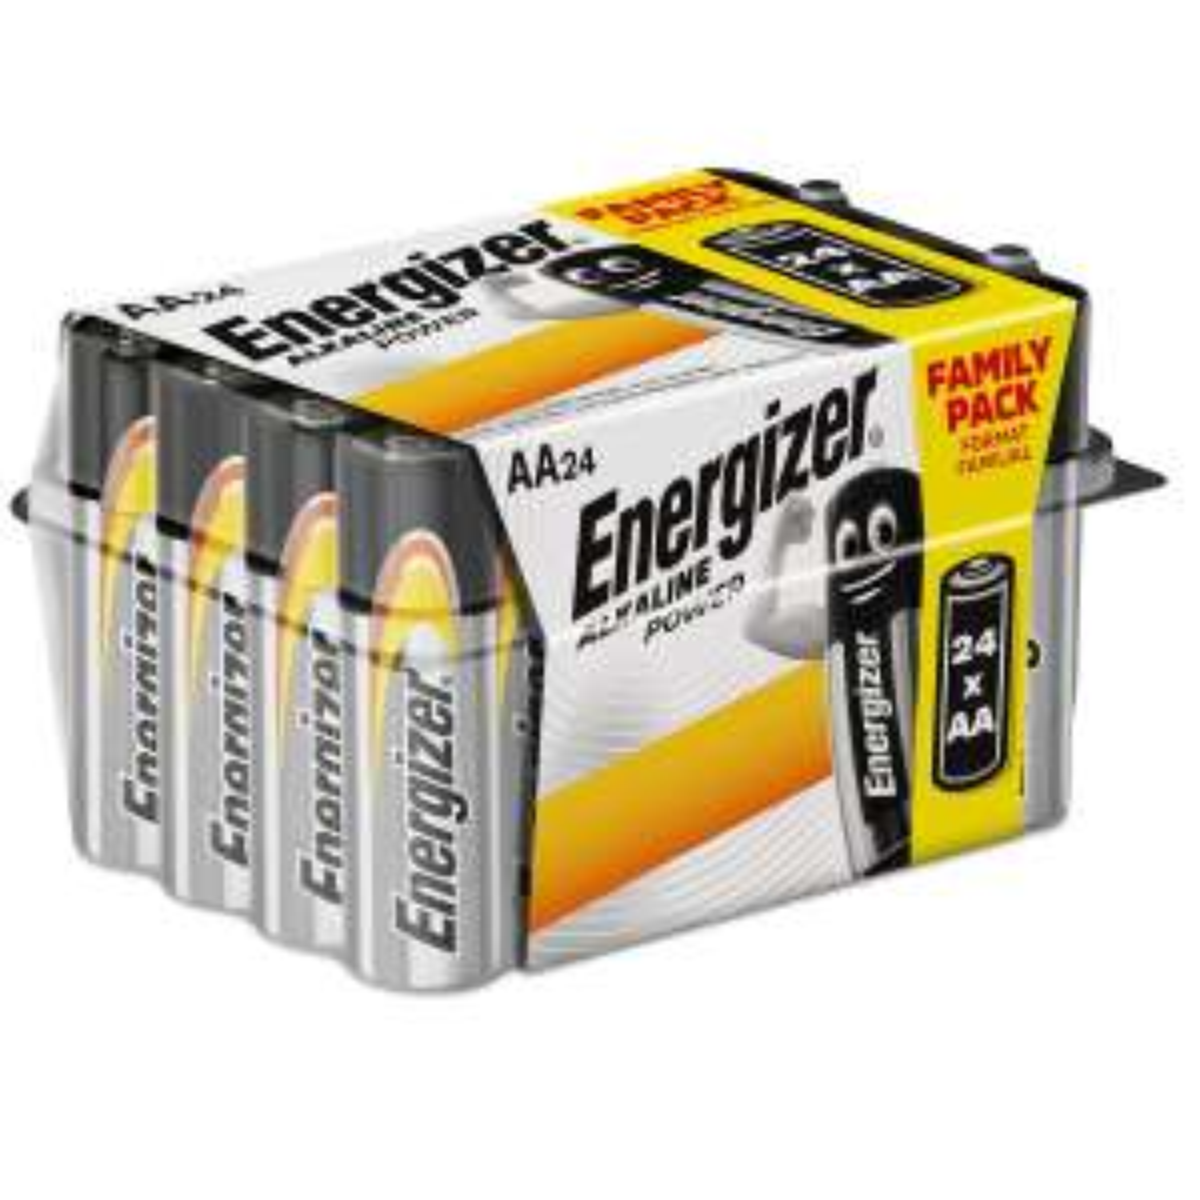 Energizer AA Alkaline Power Batteries - 24 Pack £5.99 - Free C+C @ Robert Dyas